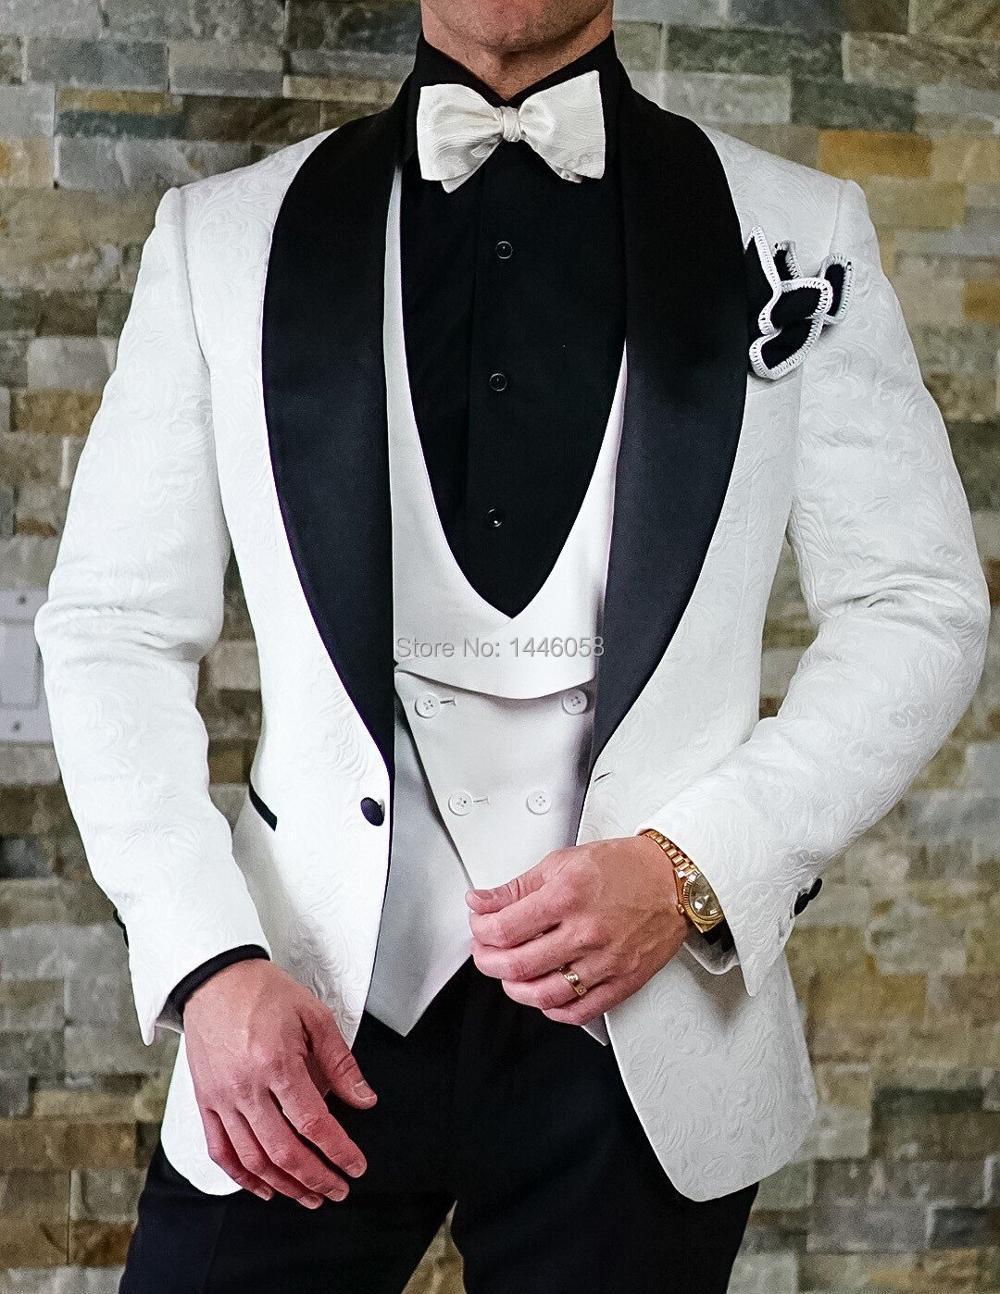 2018 New Design Men Wedding Suits Groom Formal Suit One Buttons Burgundy  Tuxedo Jacket Men Suit 2f6ed4540f2d